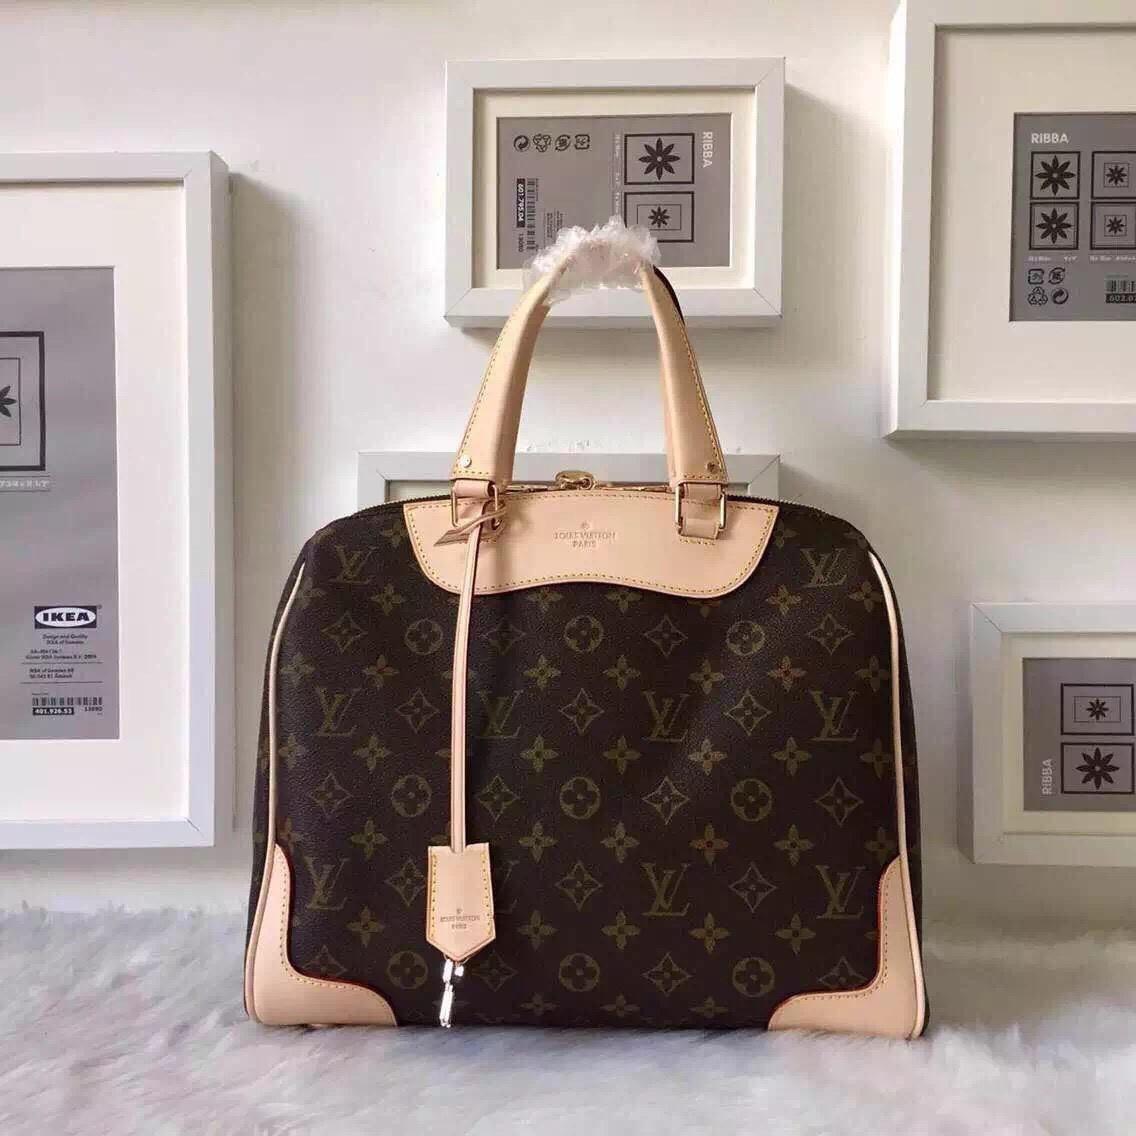 Сумка Louis Vuitton - качественные реплики сумок   vkstore.com.ua b5fe682298a